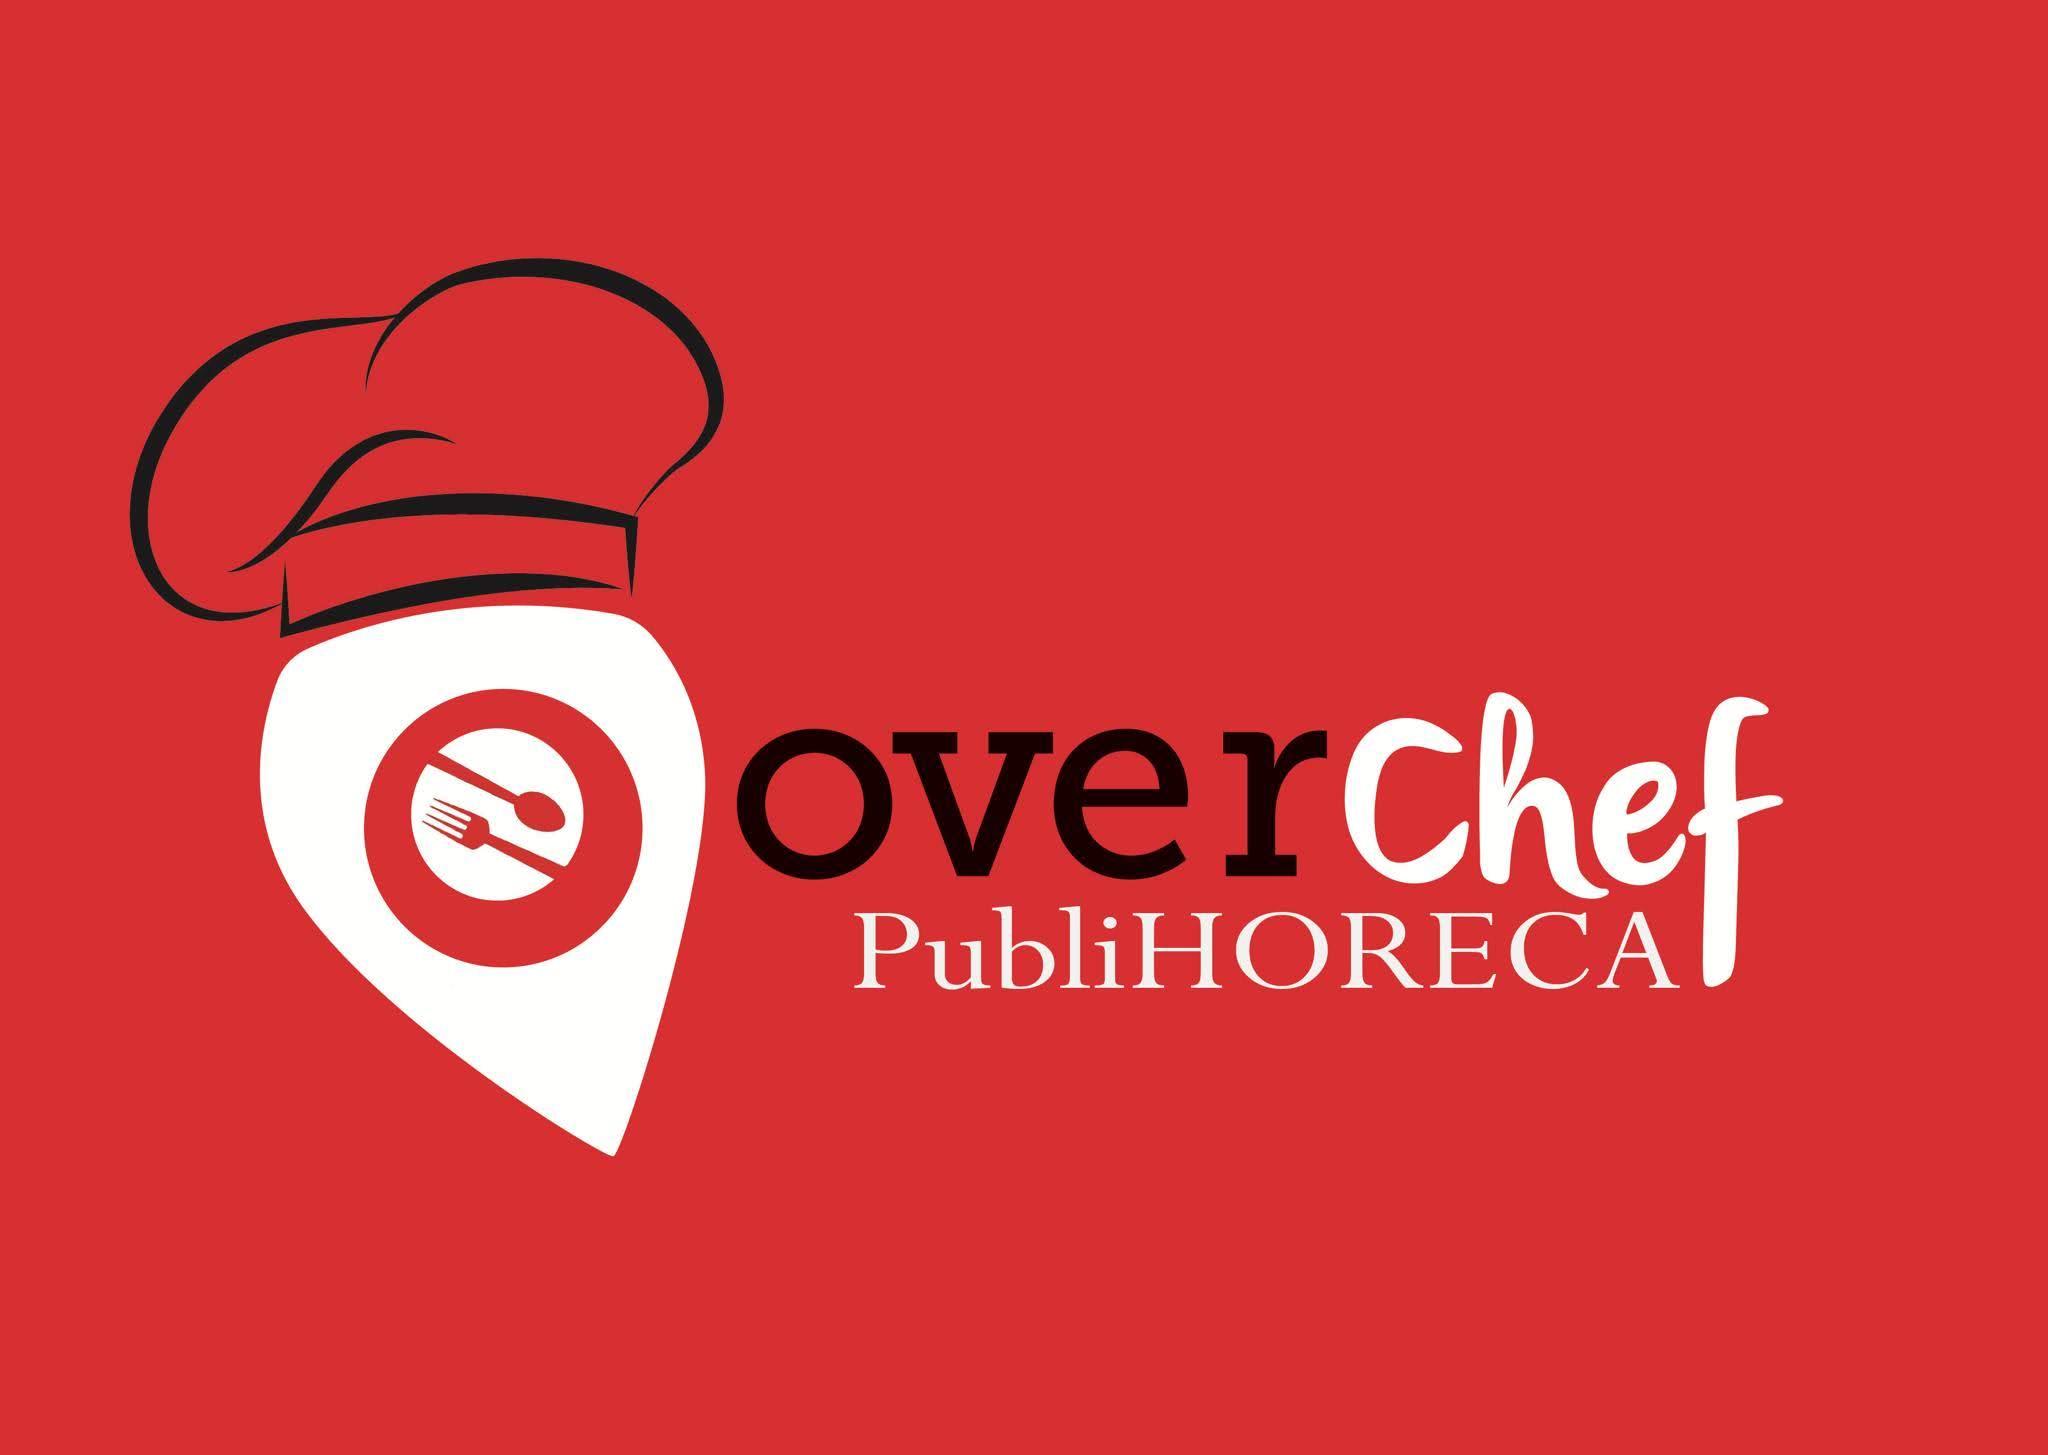 OVERCHEF